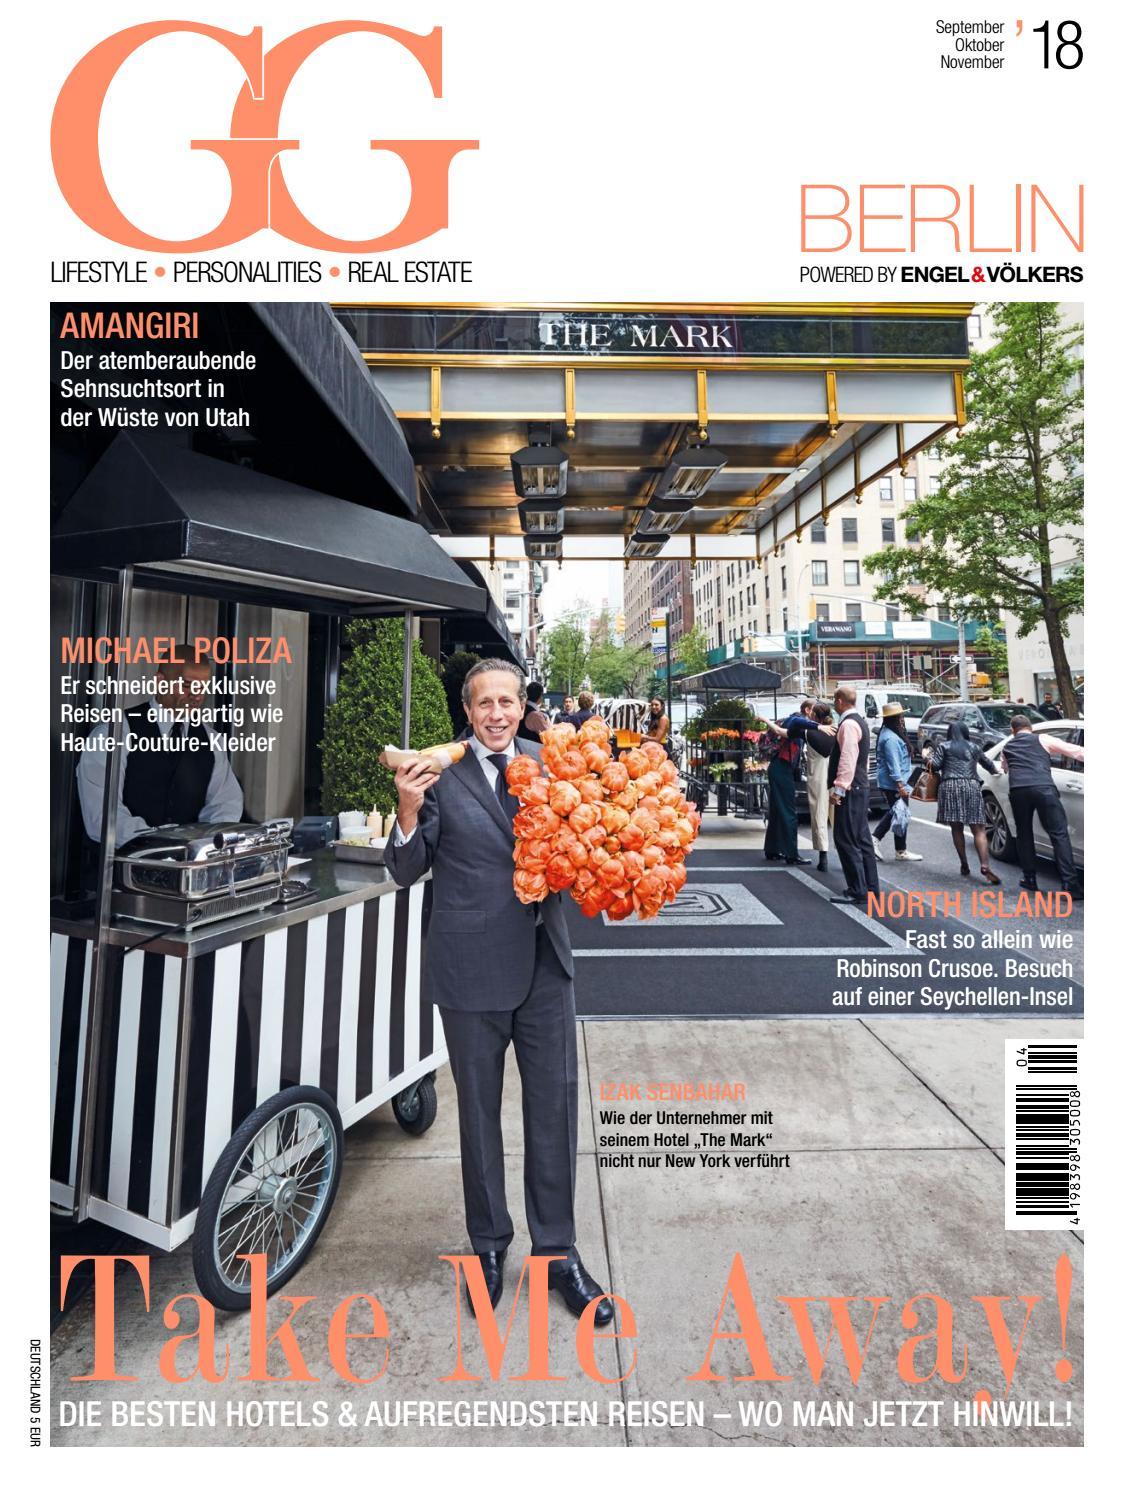 3ceeb2503731f6 GG Magazine 04/18 Berlin by GG-Magazine - issuu